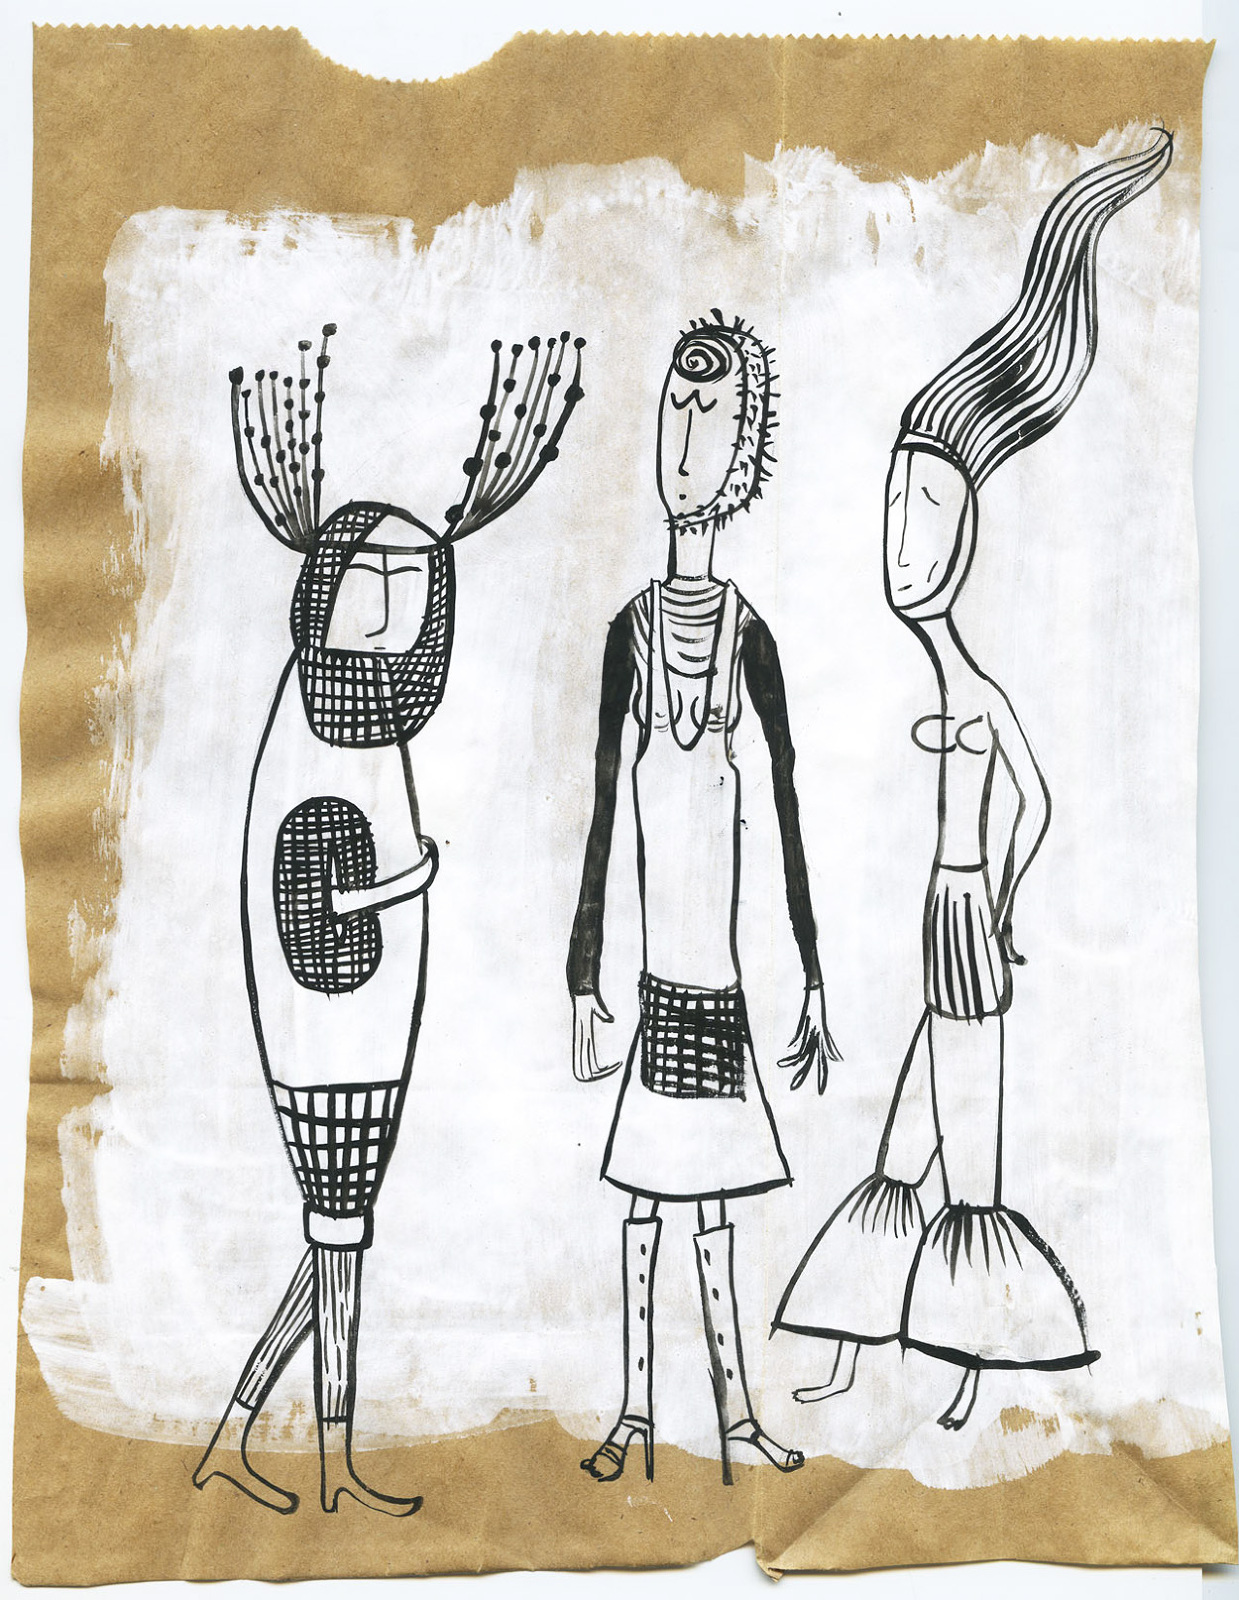 the three fashionistas